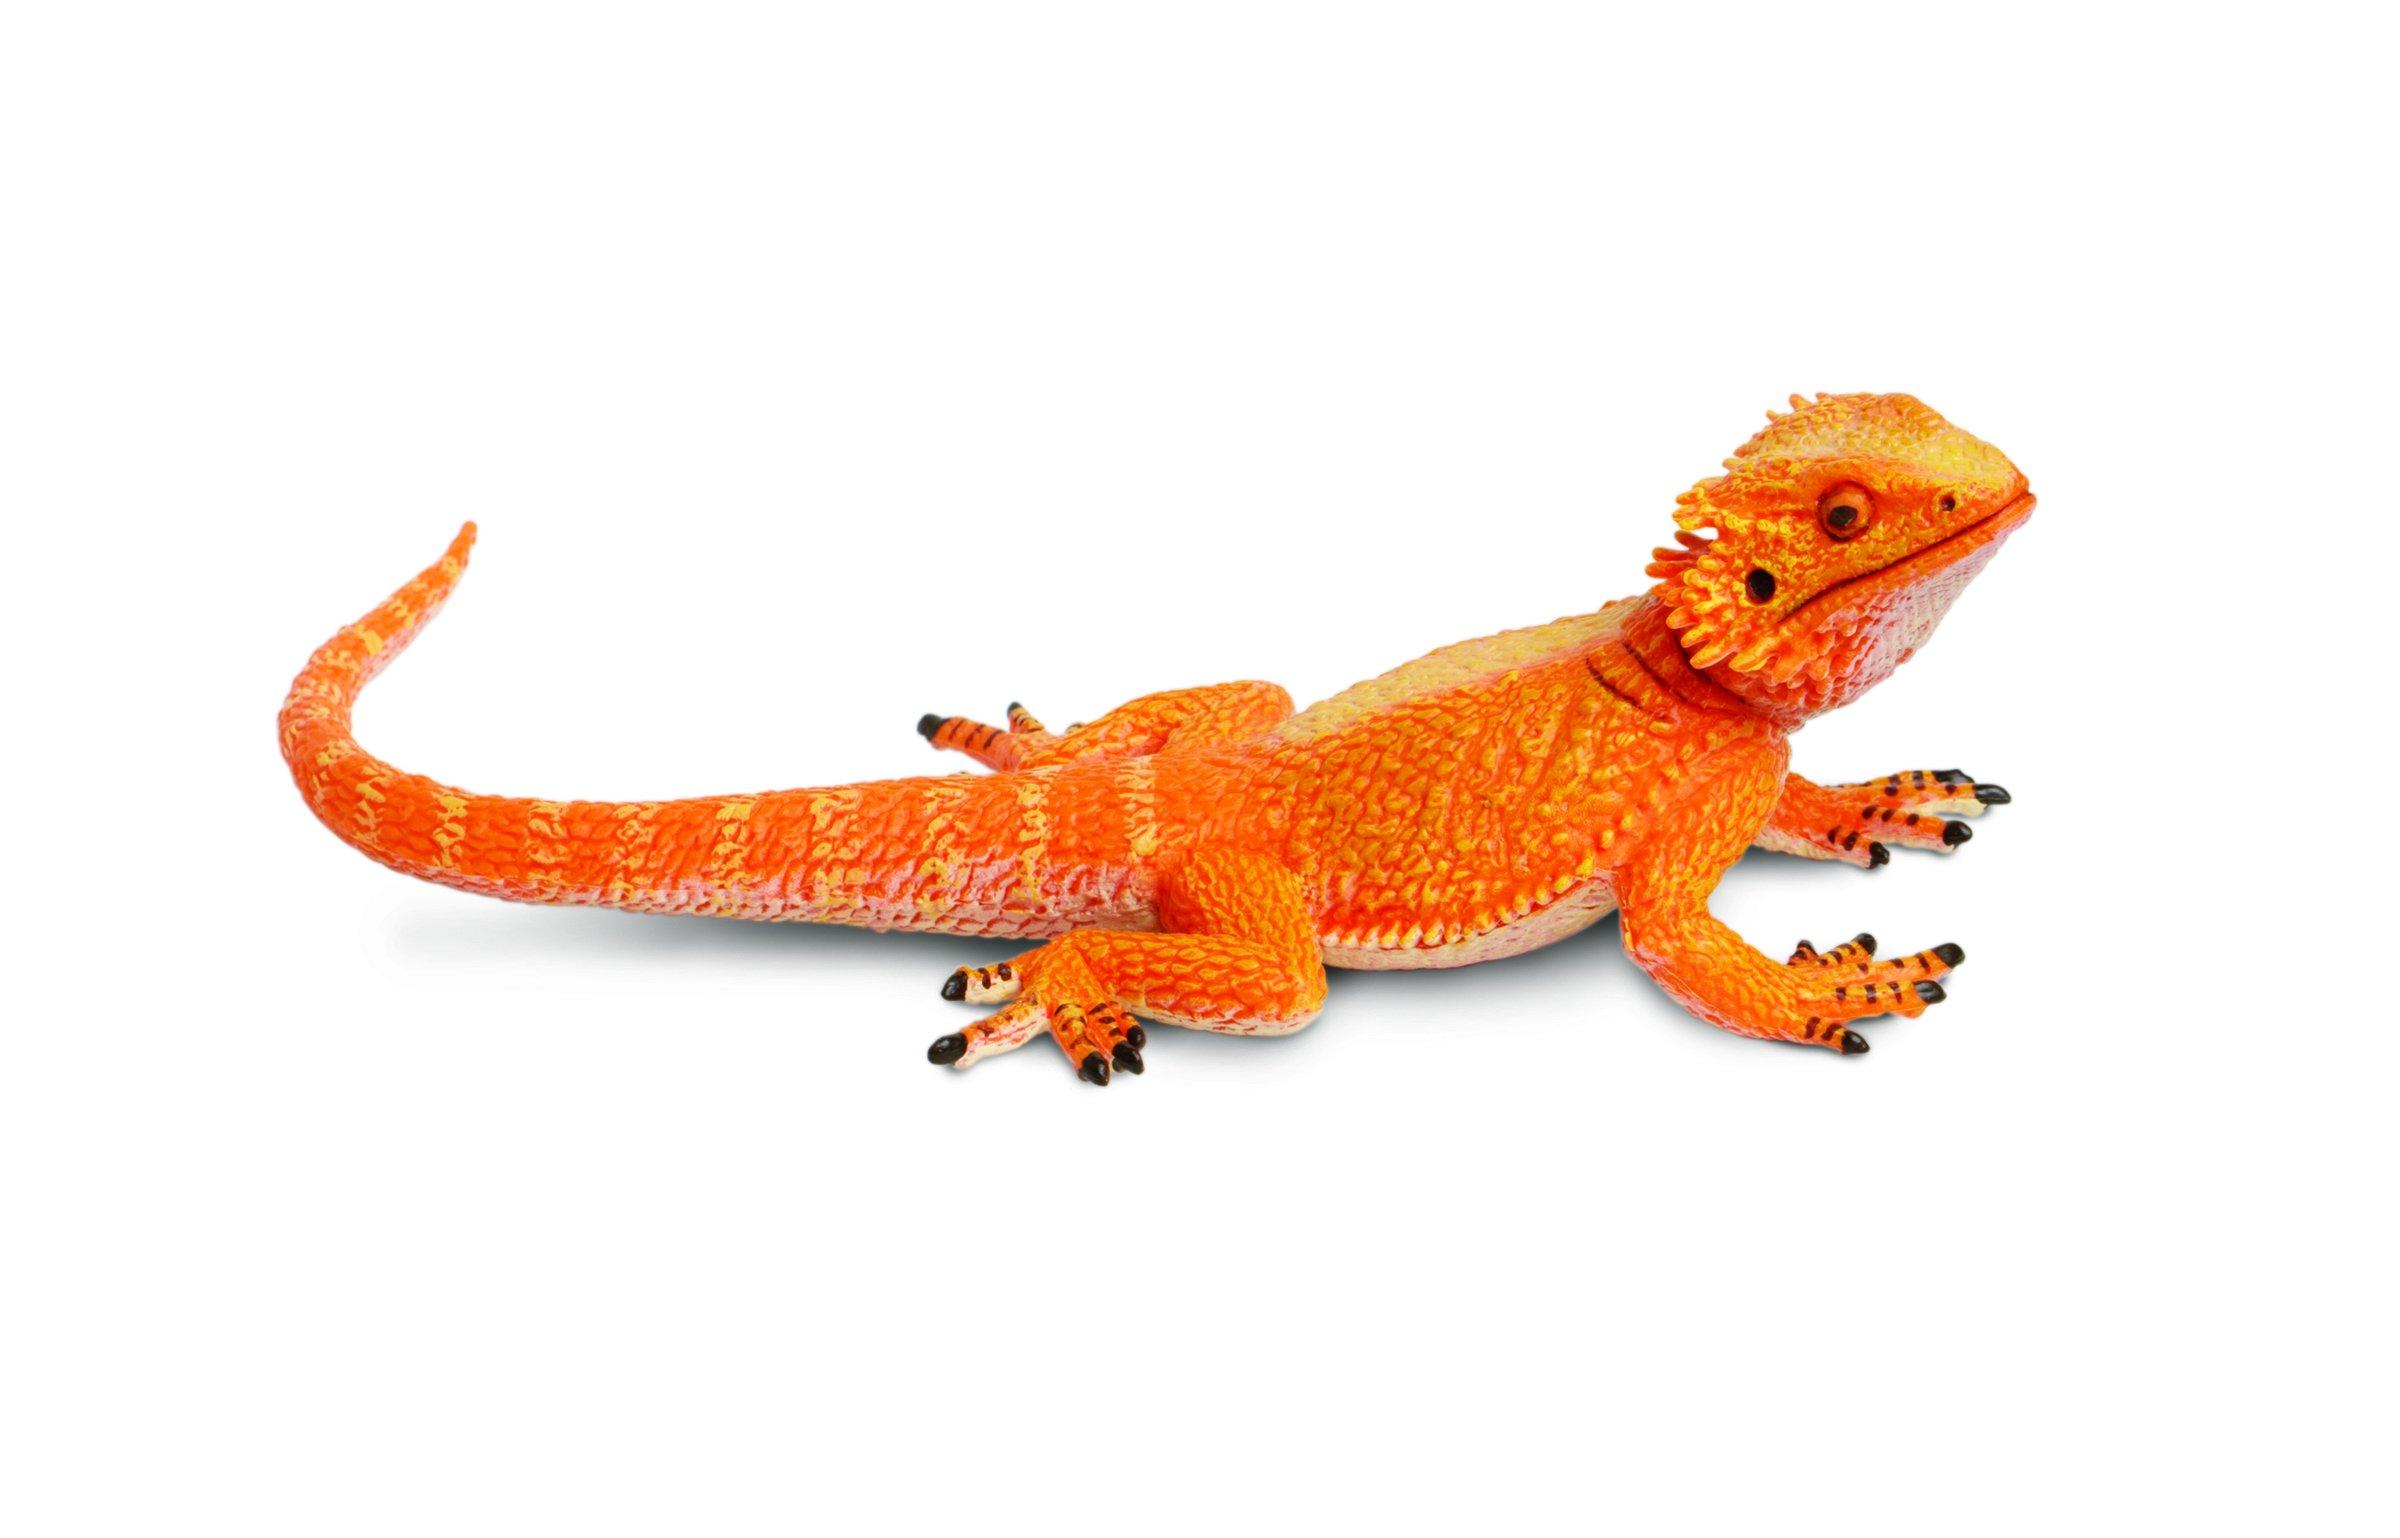 Safari Ltd Incredible Creatures Bearded Dragon